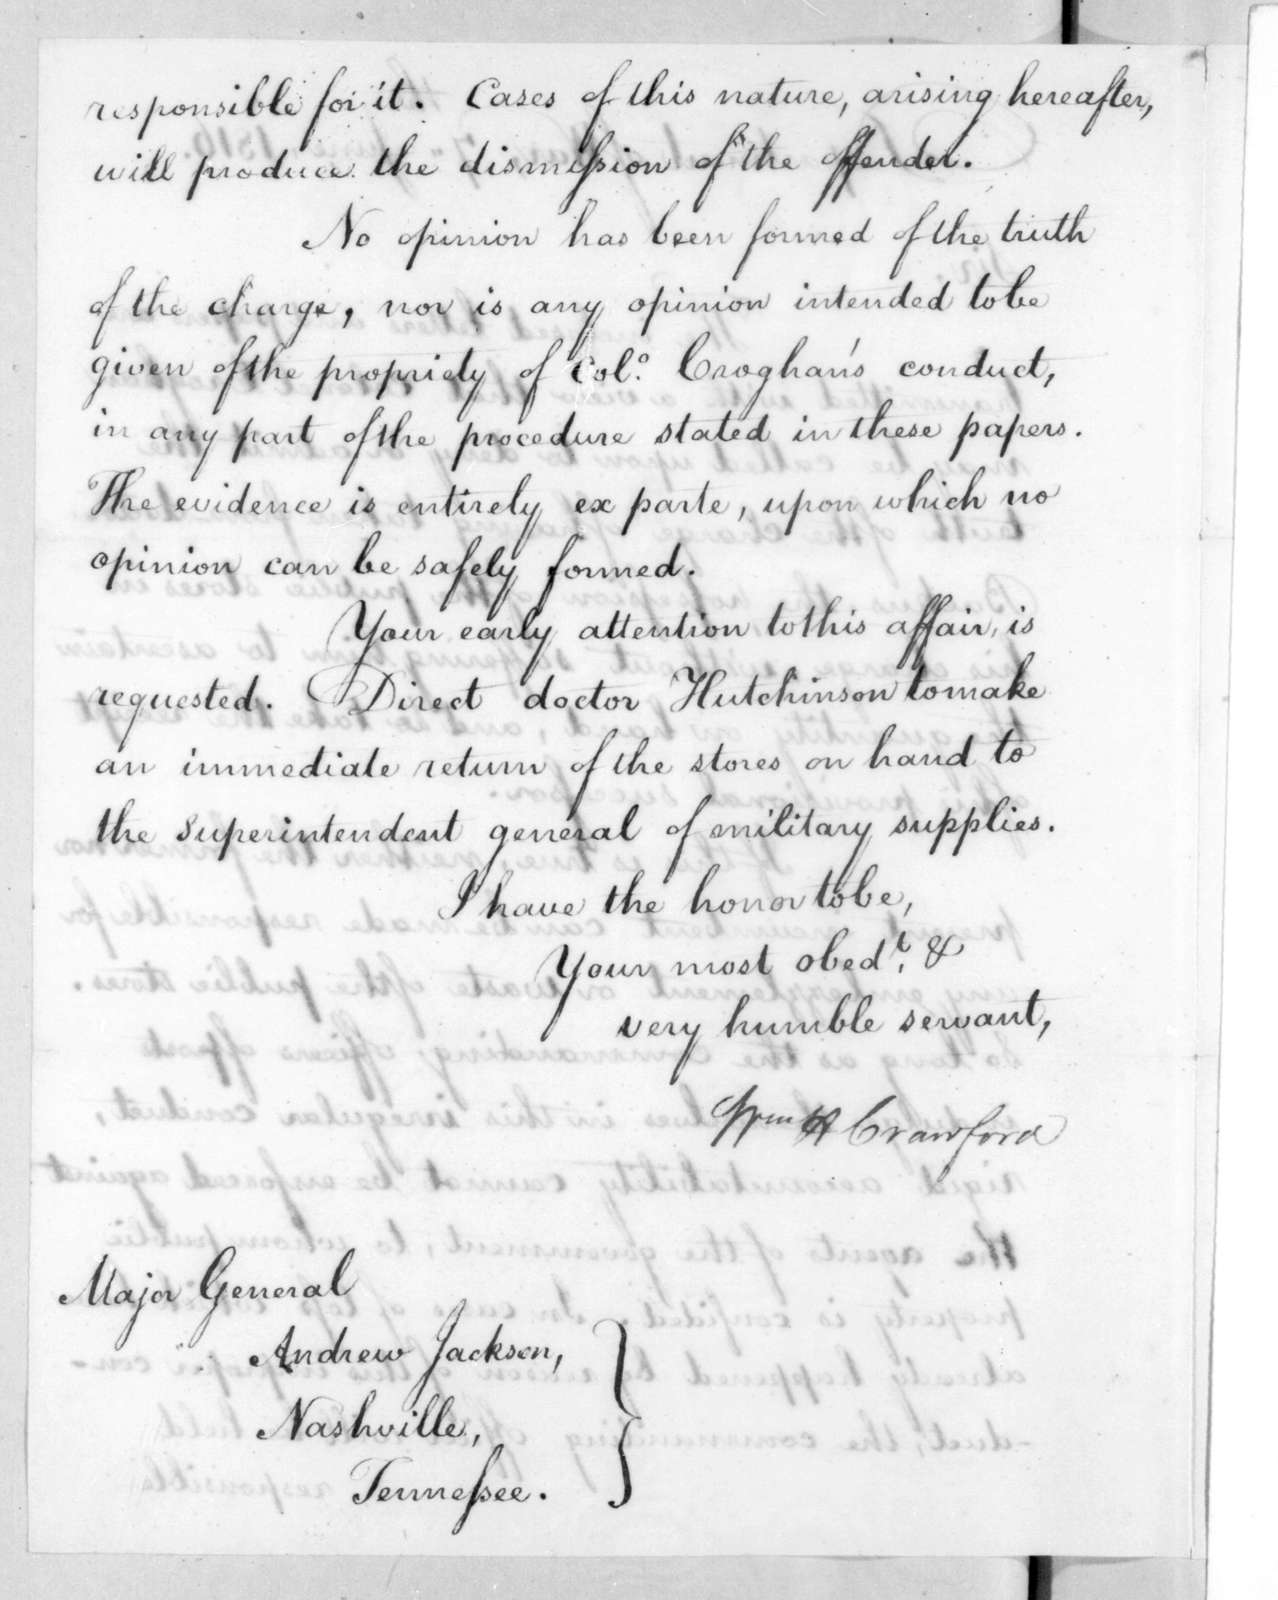 William Harris Crawford to Andrew Jackson, June 7, 1816